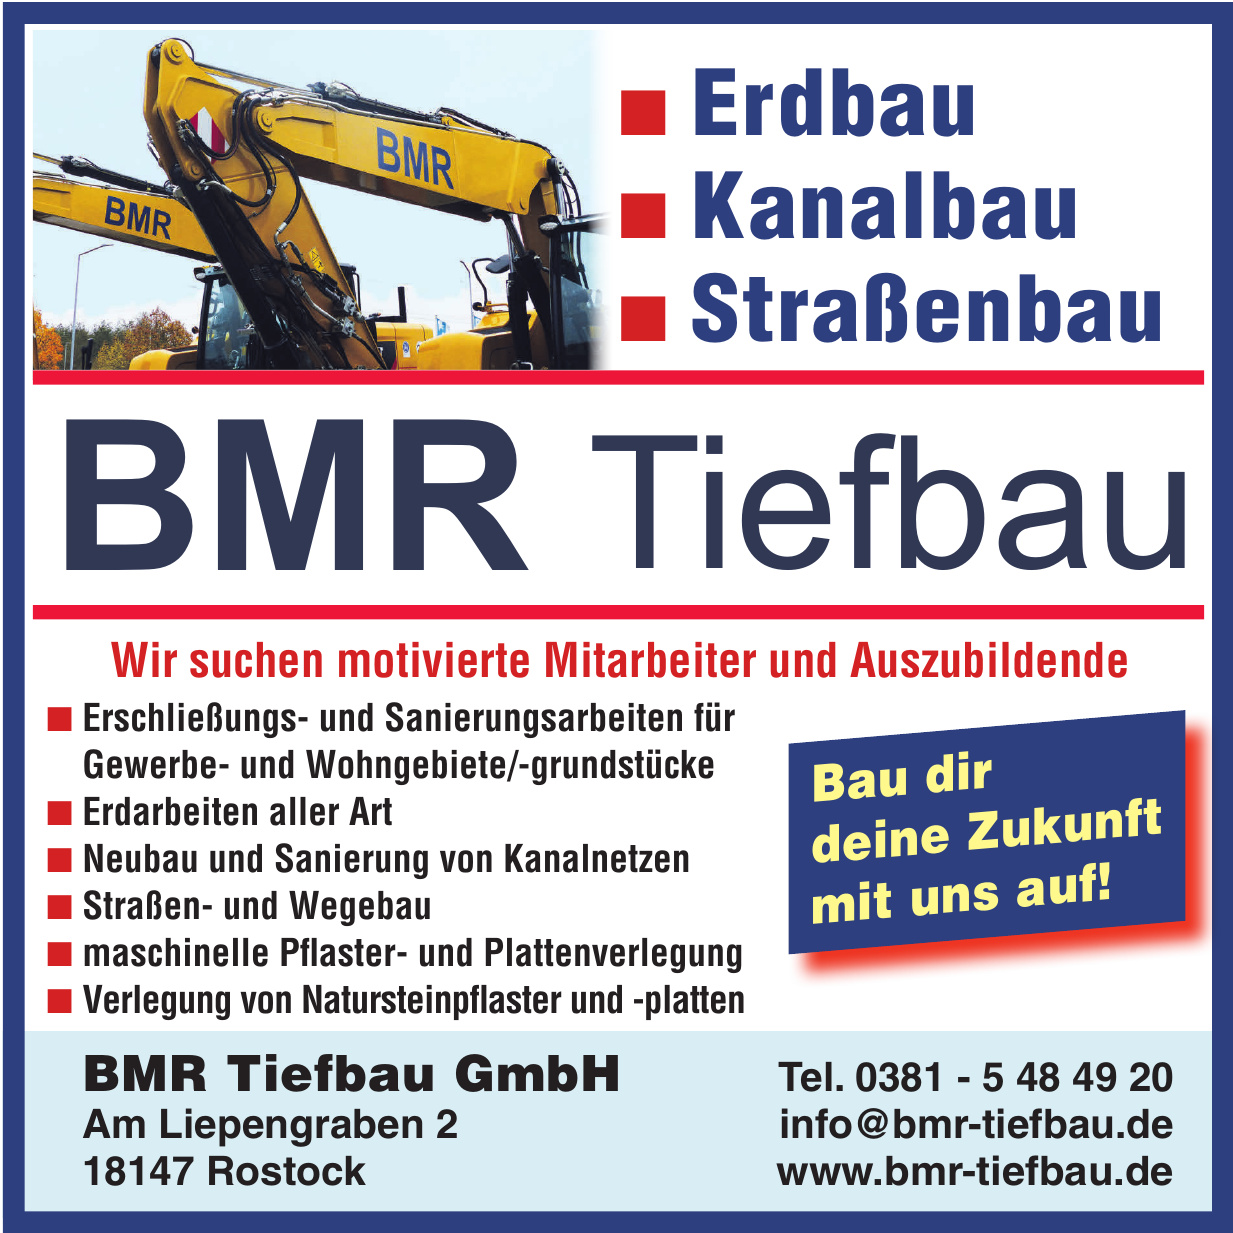 BMR Tiefbau GmbH